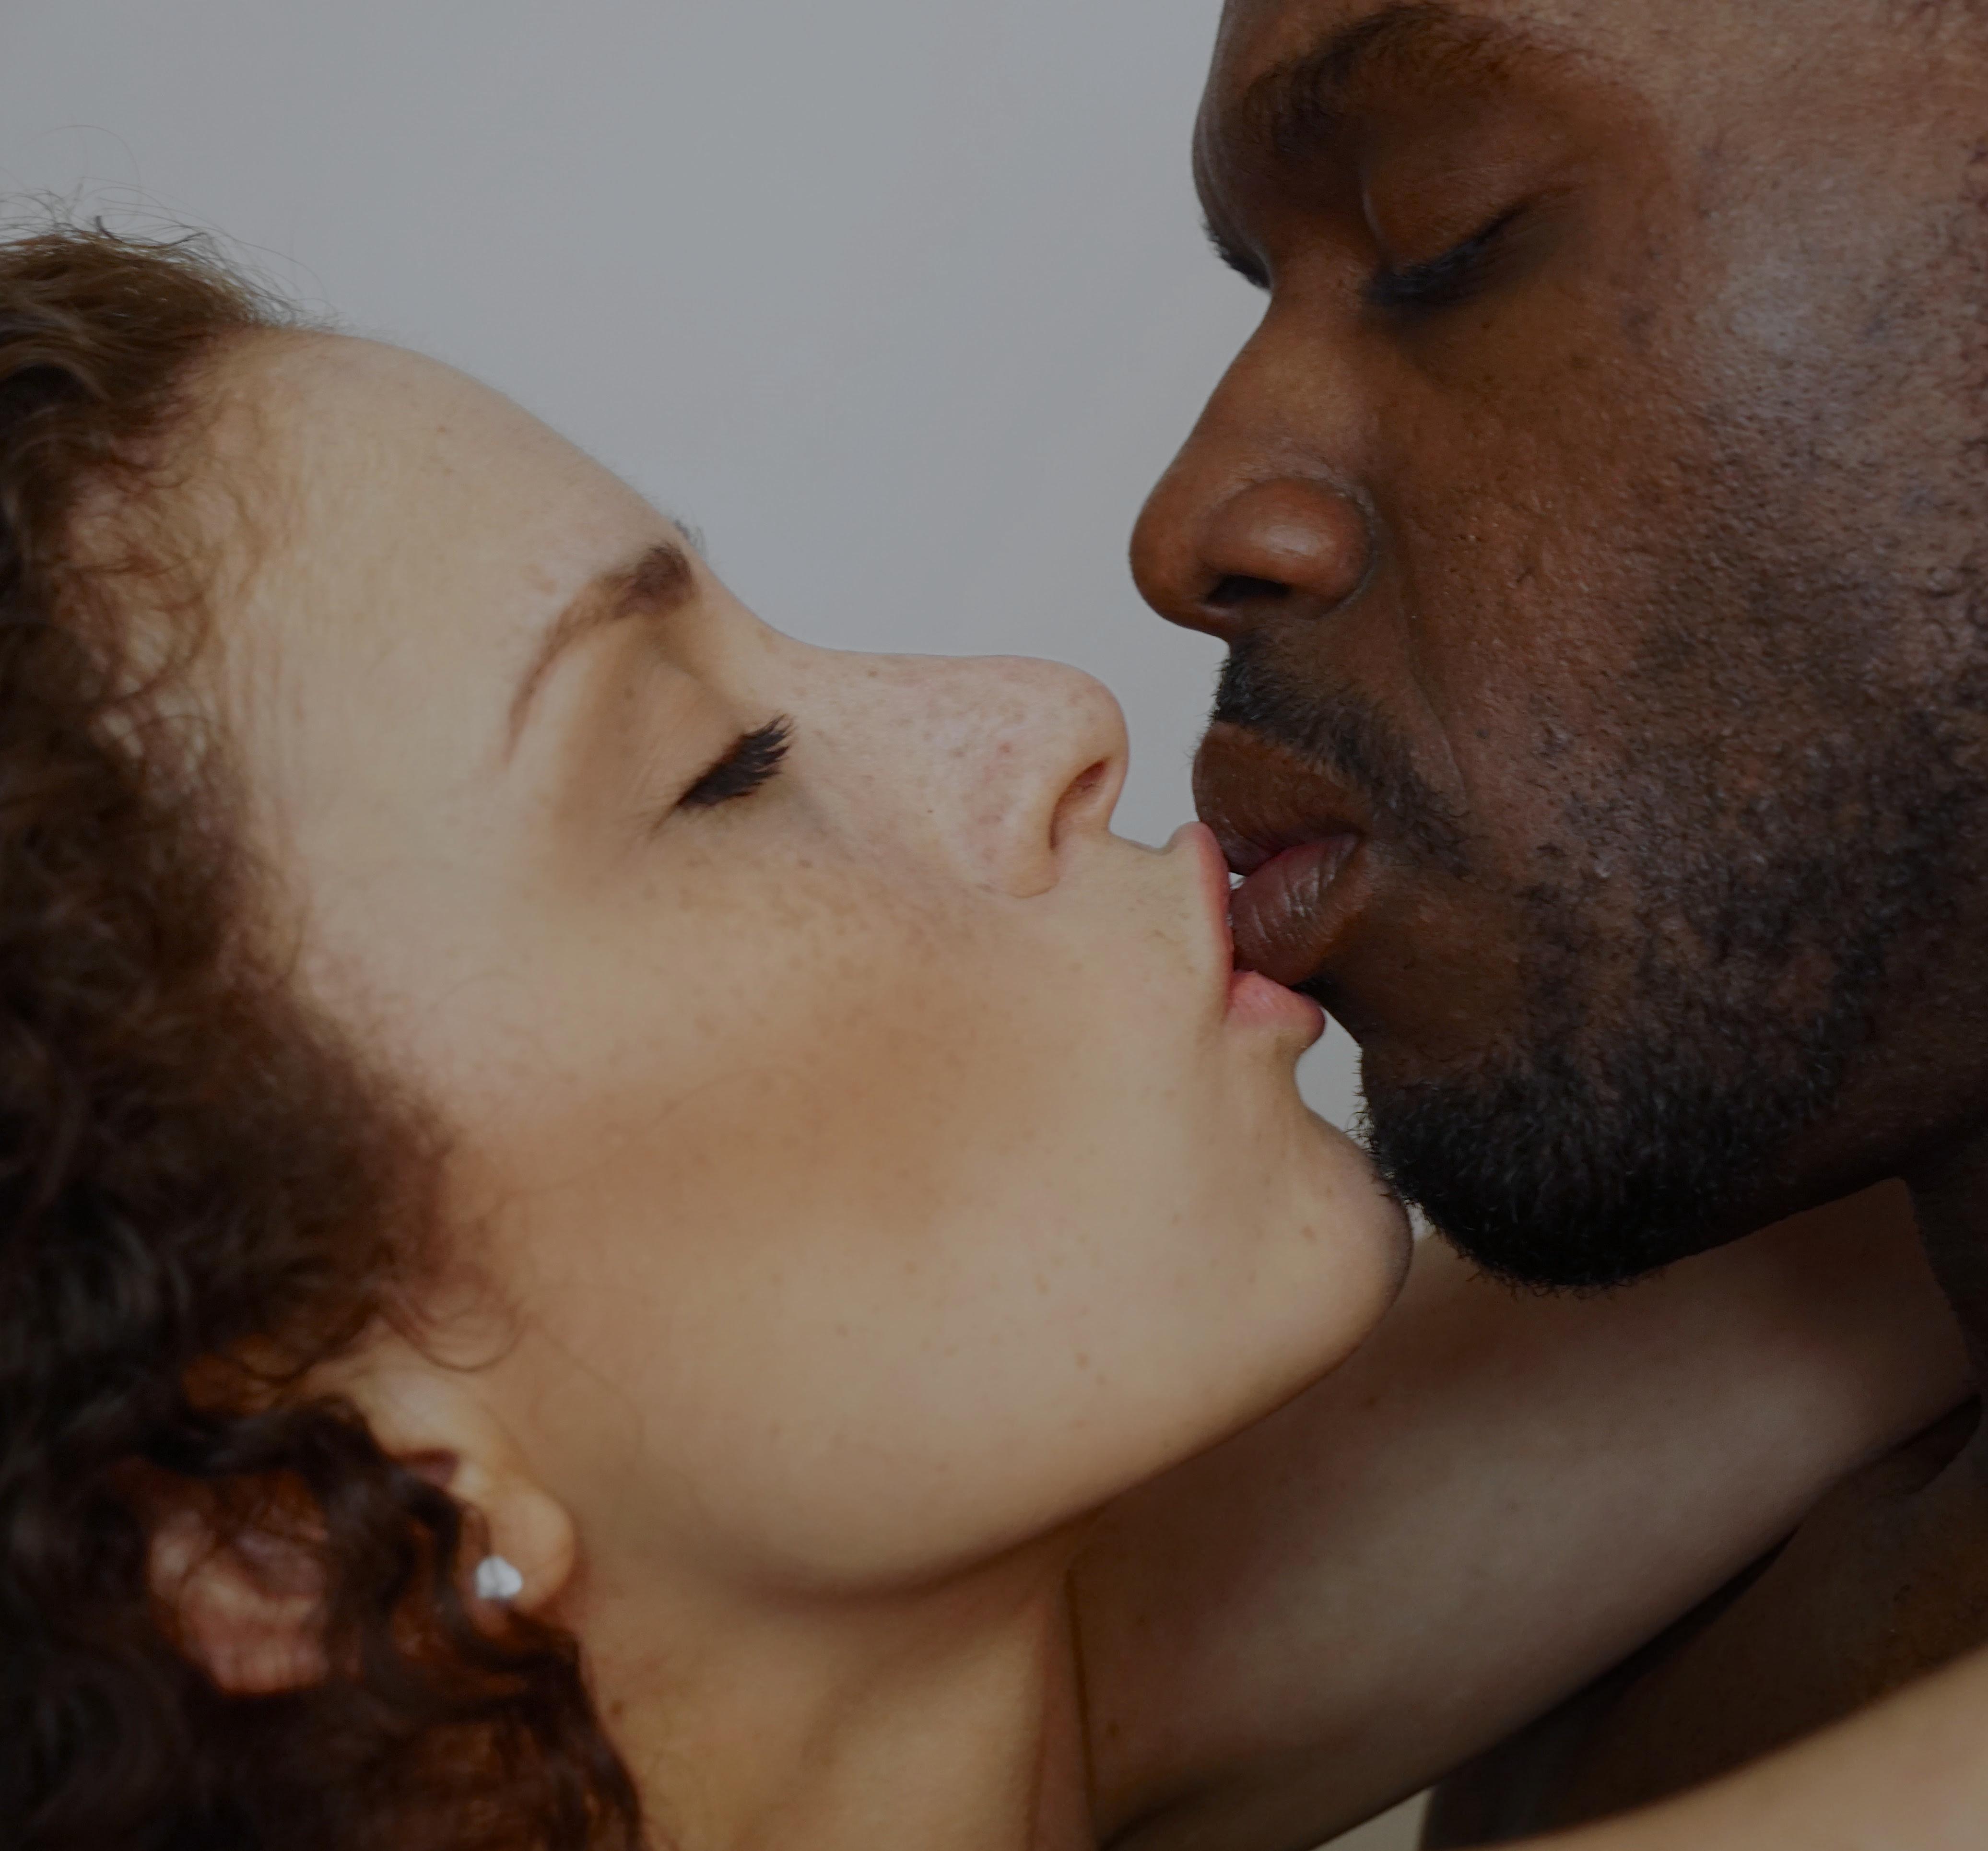 Puerto Rican woman and Jamaican man kiss